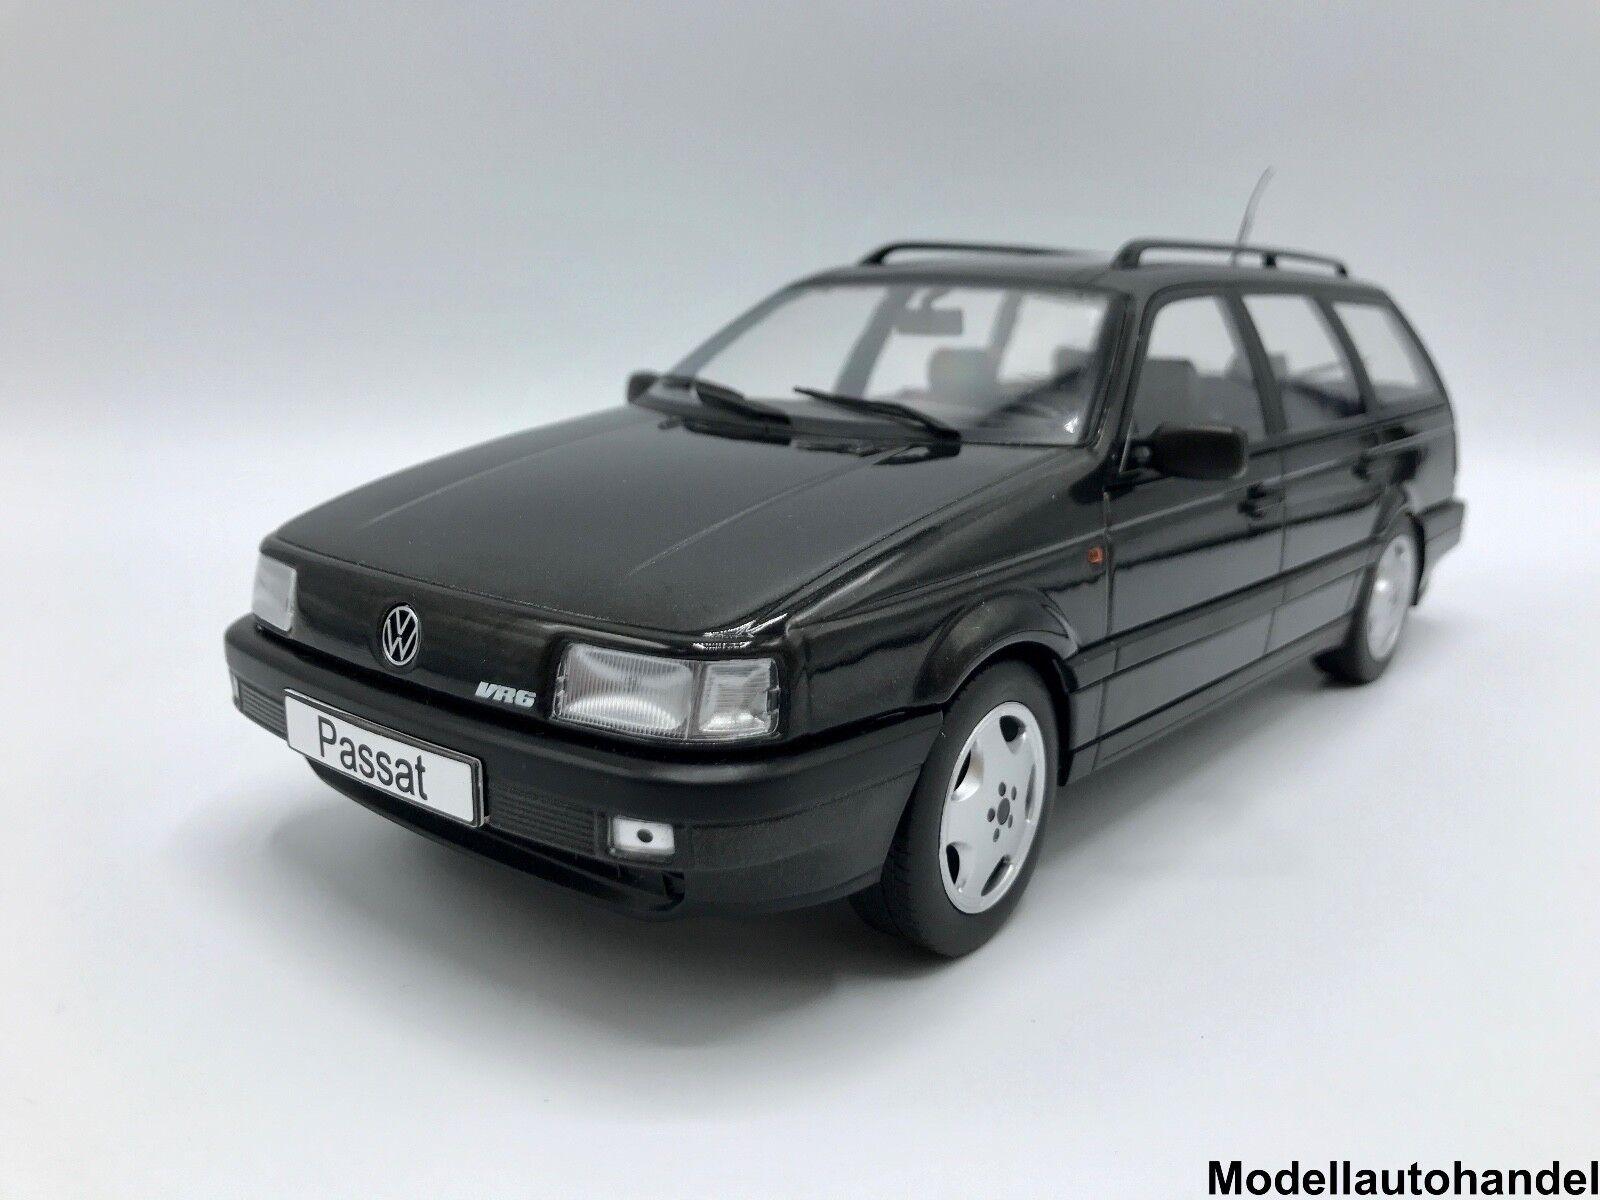 VW Volkswagen passat b3 vr6 VARIANT 1988-Metallic-Noir - 1 18 KK-Scale